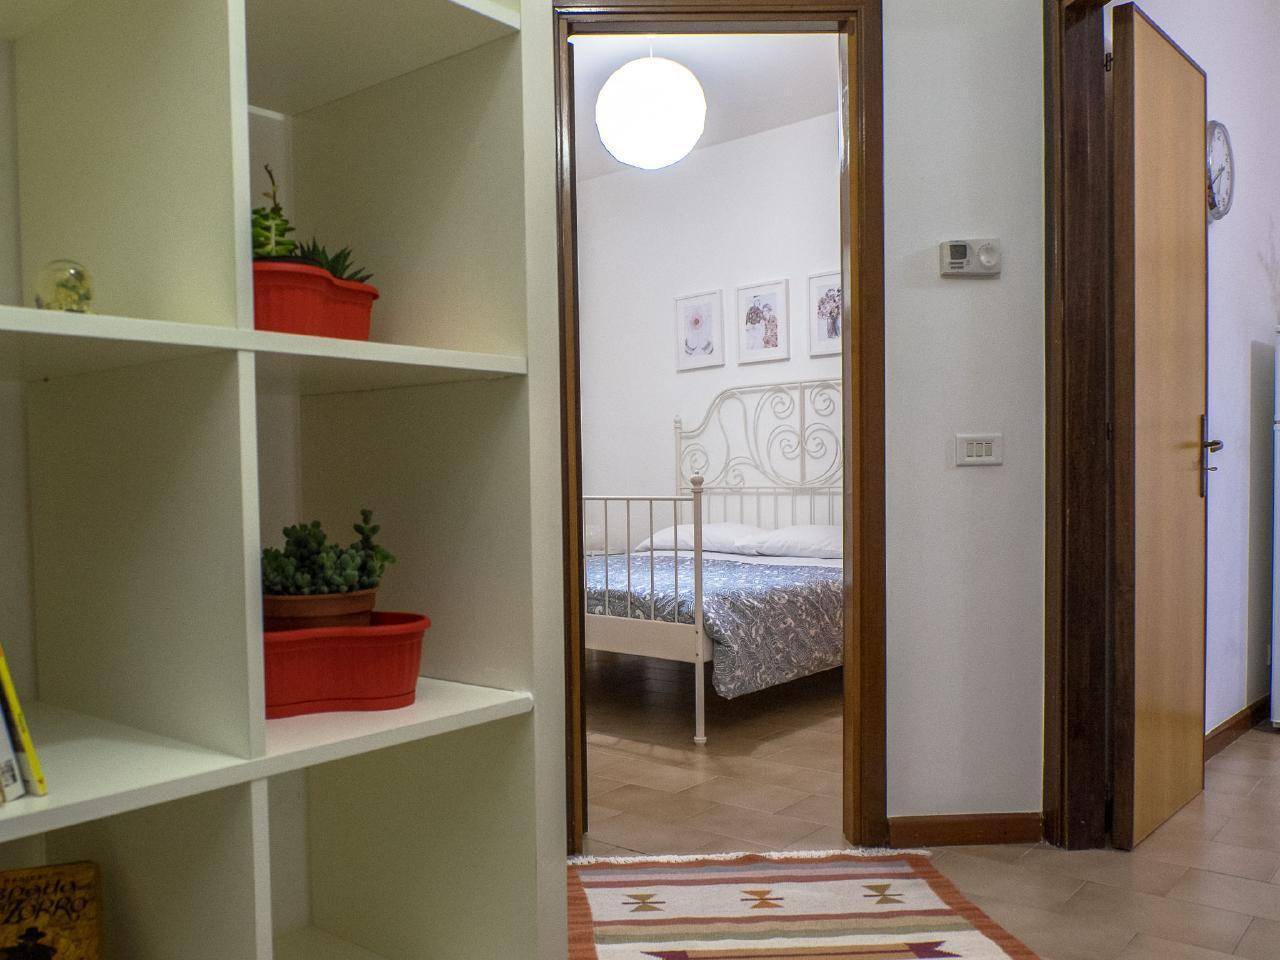 Ferienhaus Beim Schriftsteller zu Hause (2655674), Matera, Matera, Basilikata, Italien, Bild 10